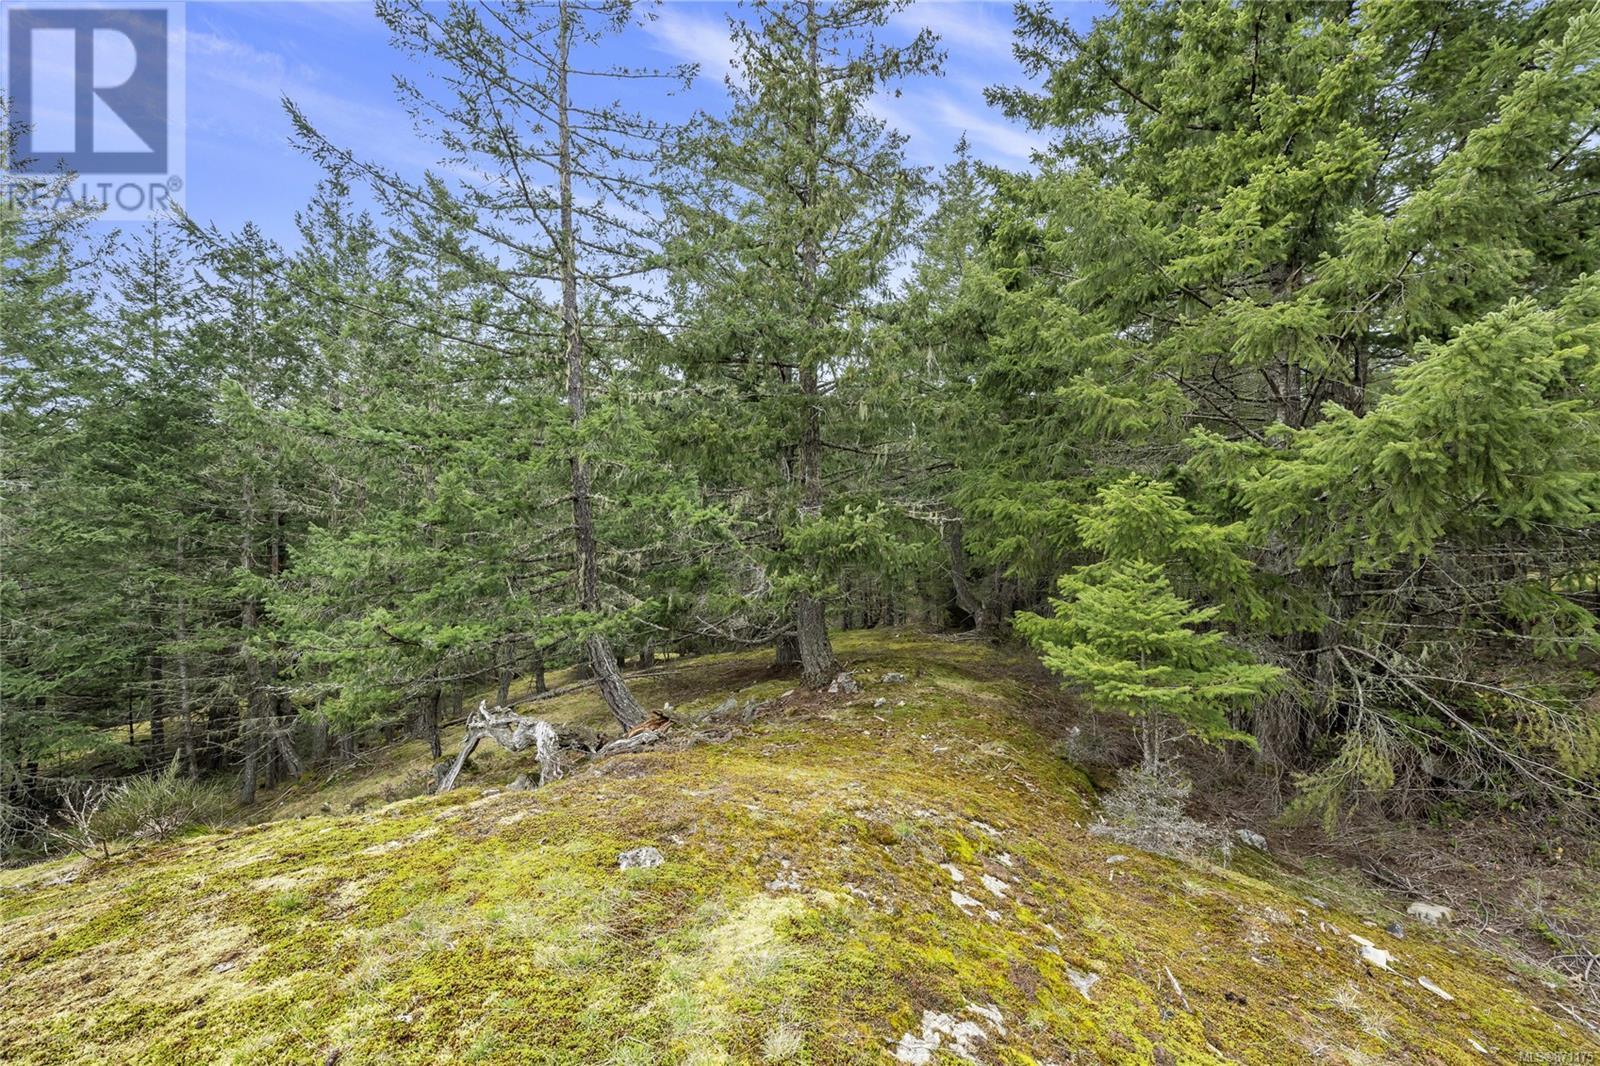 Lot A Armand WaySalt Spring, British Columbia  V8K 2B6 - Photo 11 - 871175